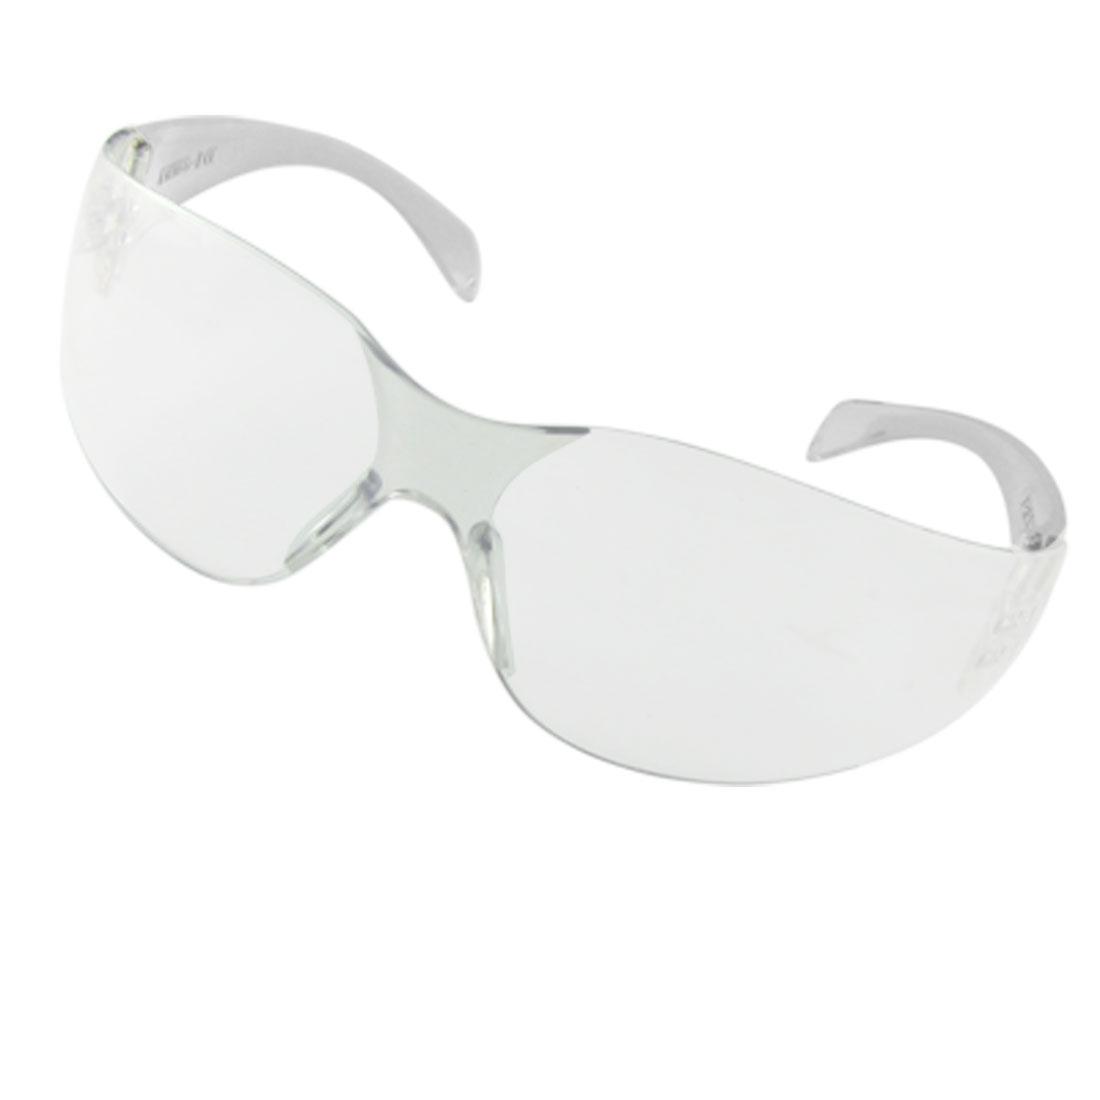 Unisex Transparent Plastic Frame Clear Lens Sports Sunglasses